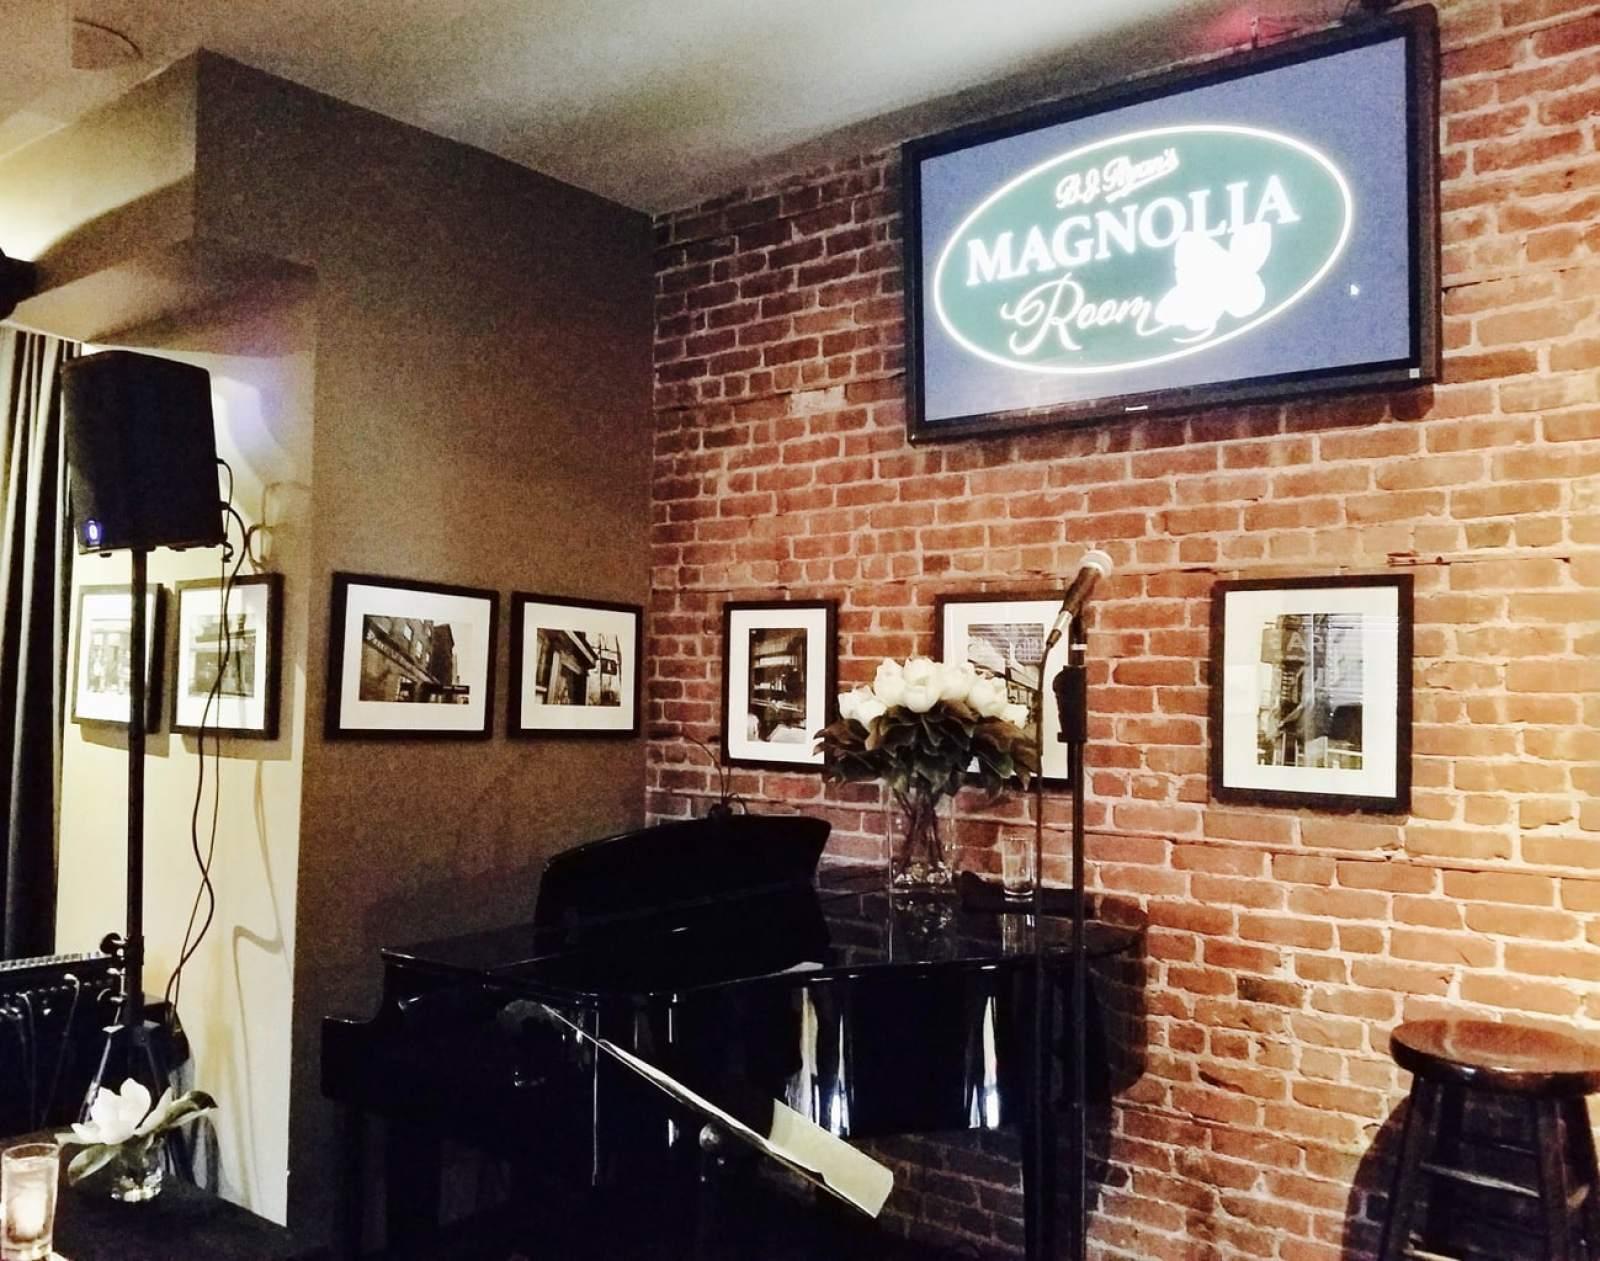 Magnolia Room Cabaret at B.J. Ryan's, Norwalk CT